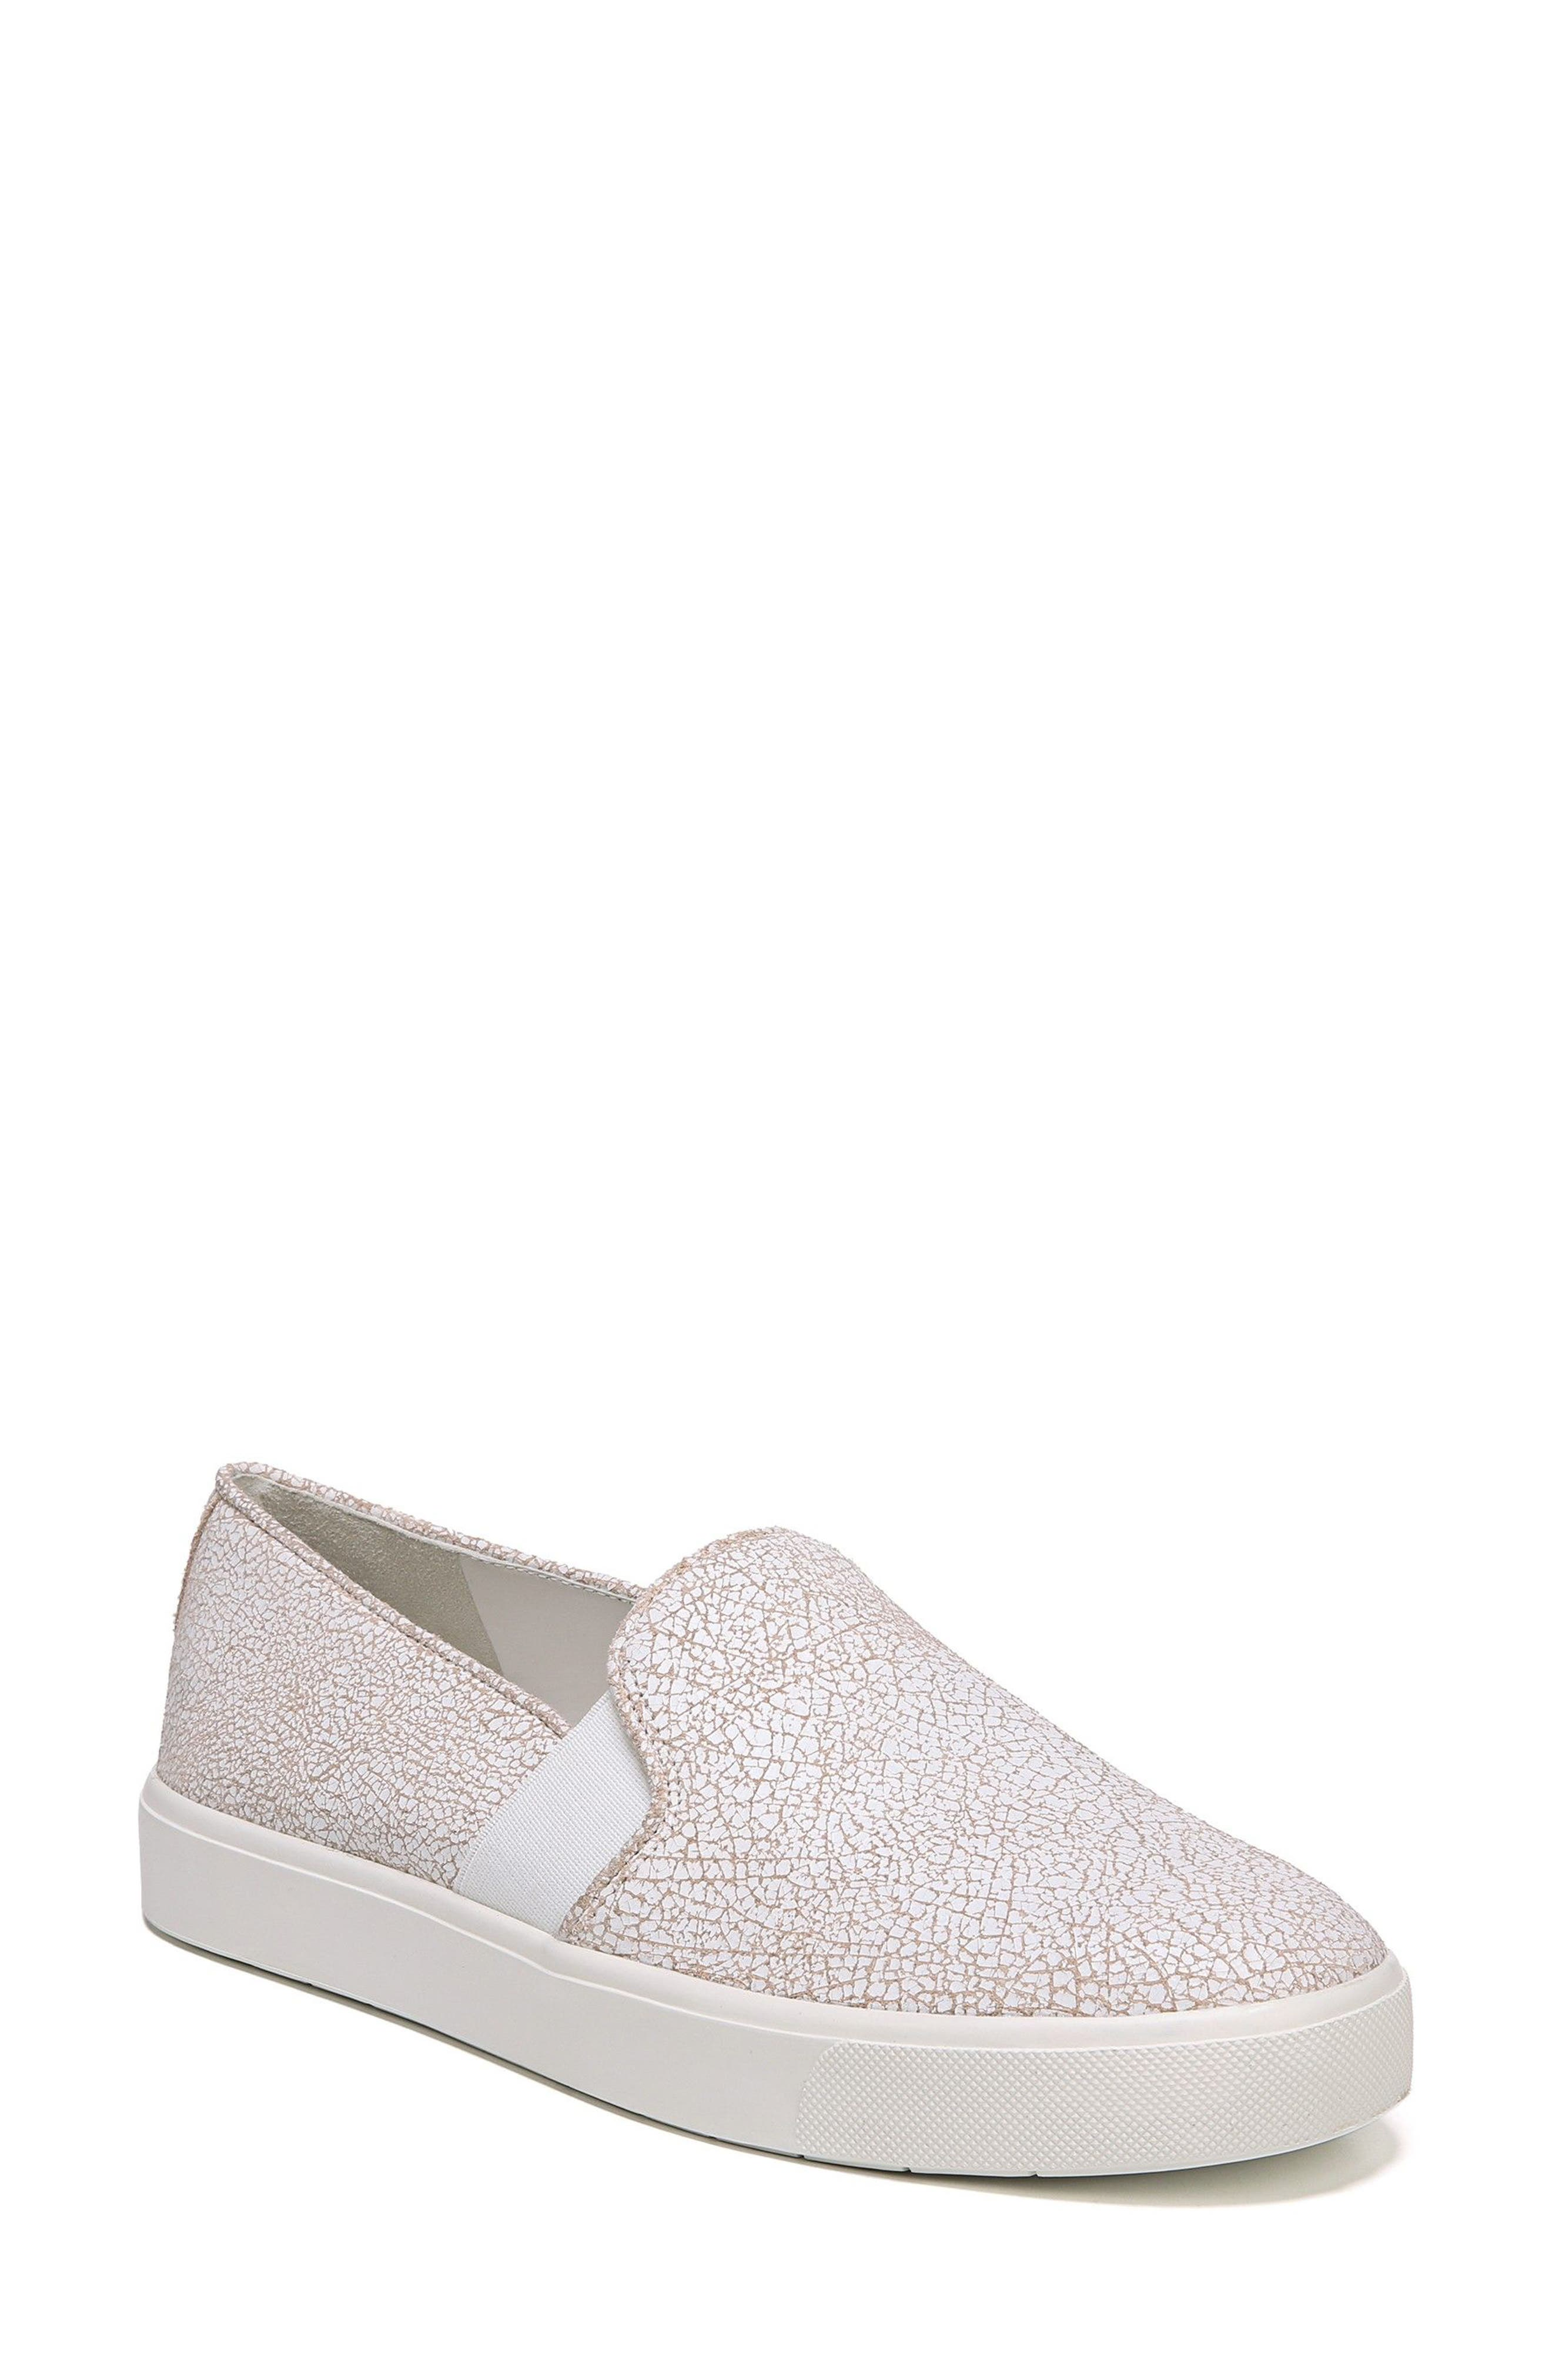 'Blair 12' Leather Slip-On Sneaker,                             Main thumbnail 1, color,                             White